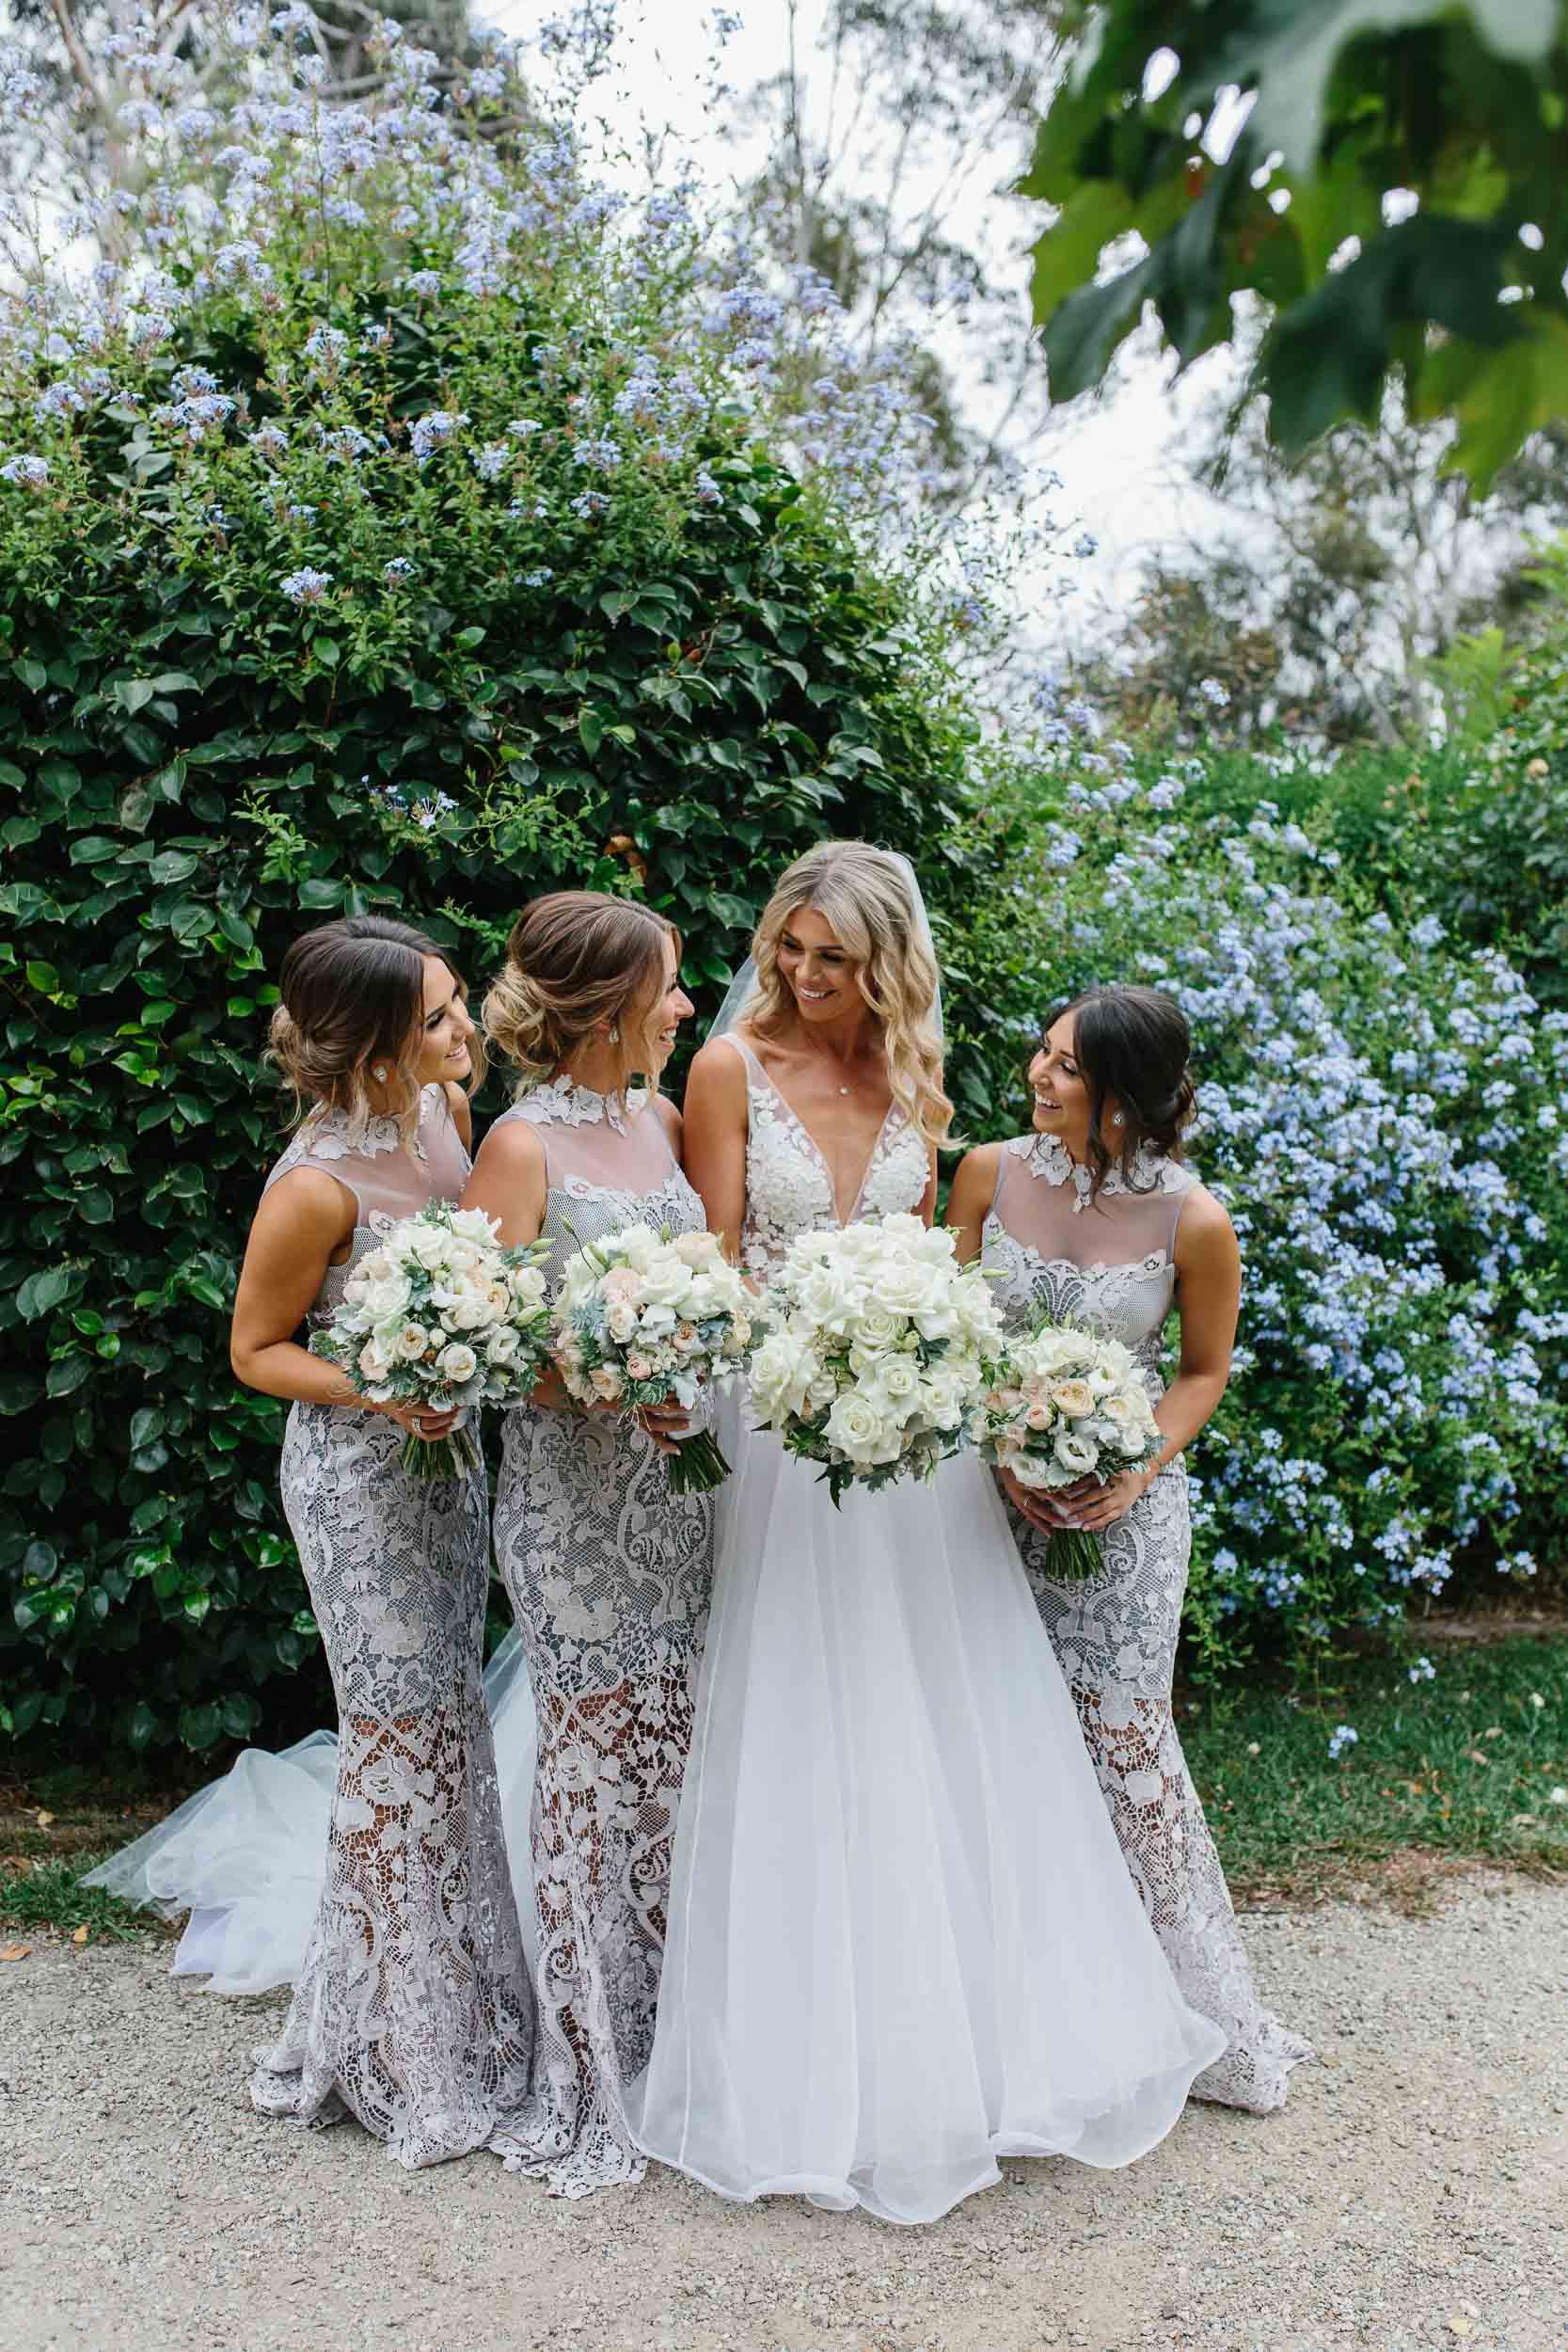 Kas-Richards-Mornington-Peninsula-Private-Property-Wedding-Marianna-Hardwick-Gown-126.jpg